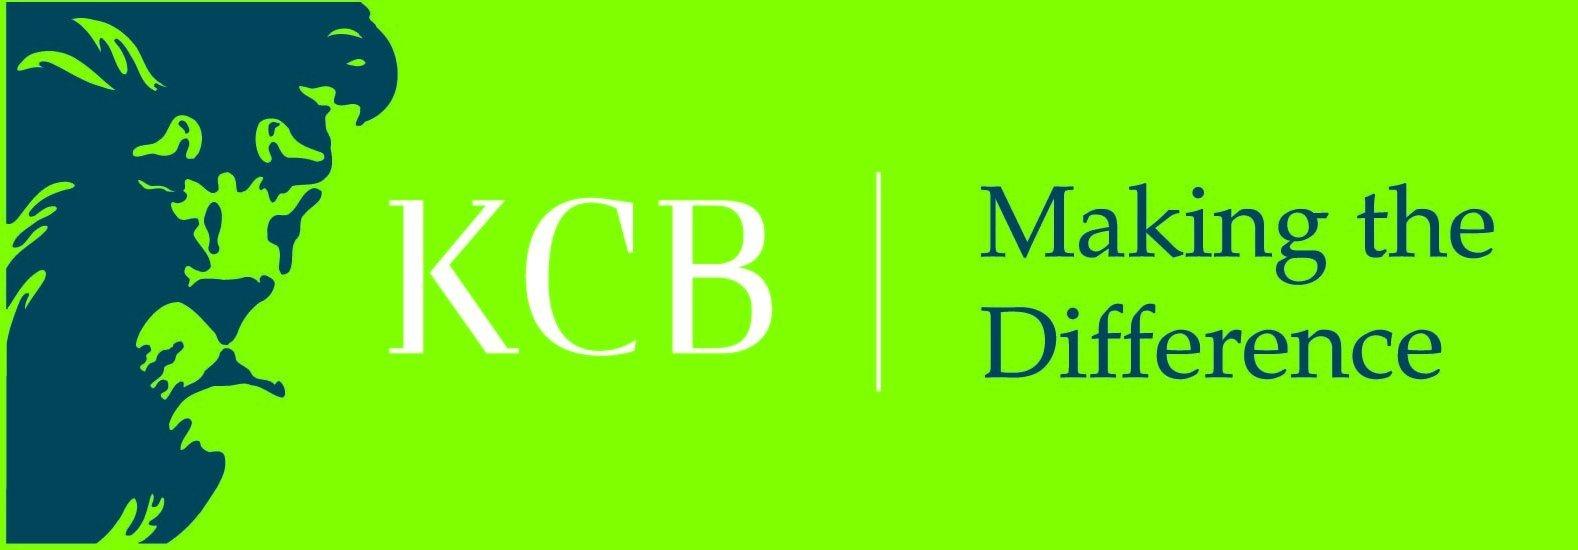 KCB Bank pre-tax profit surges to Rwf2.5 billion